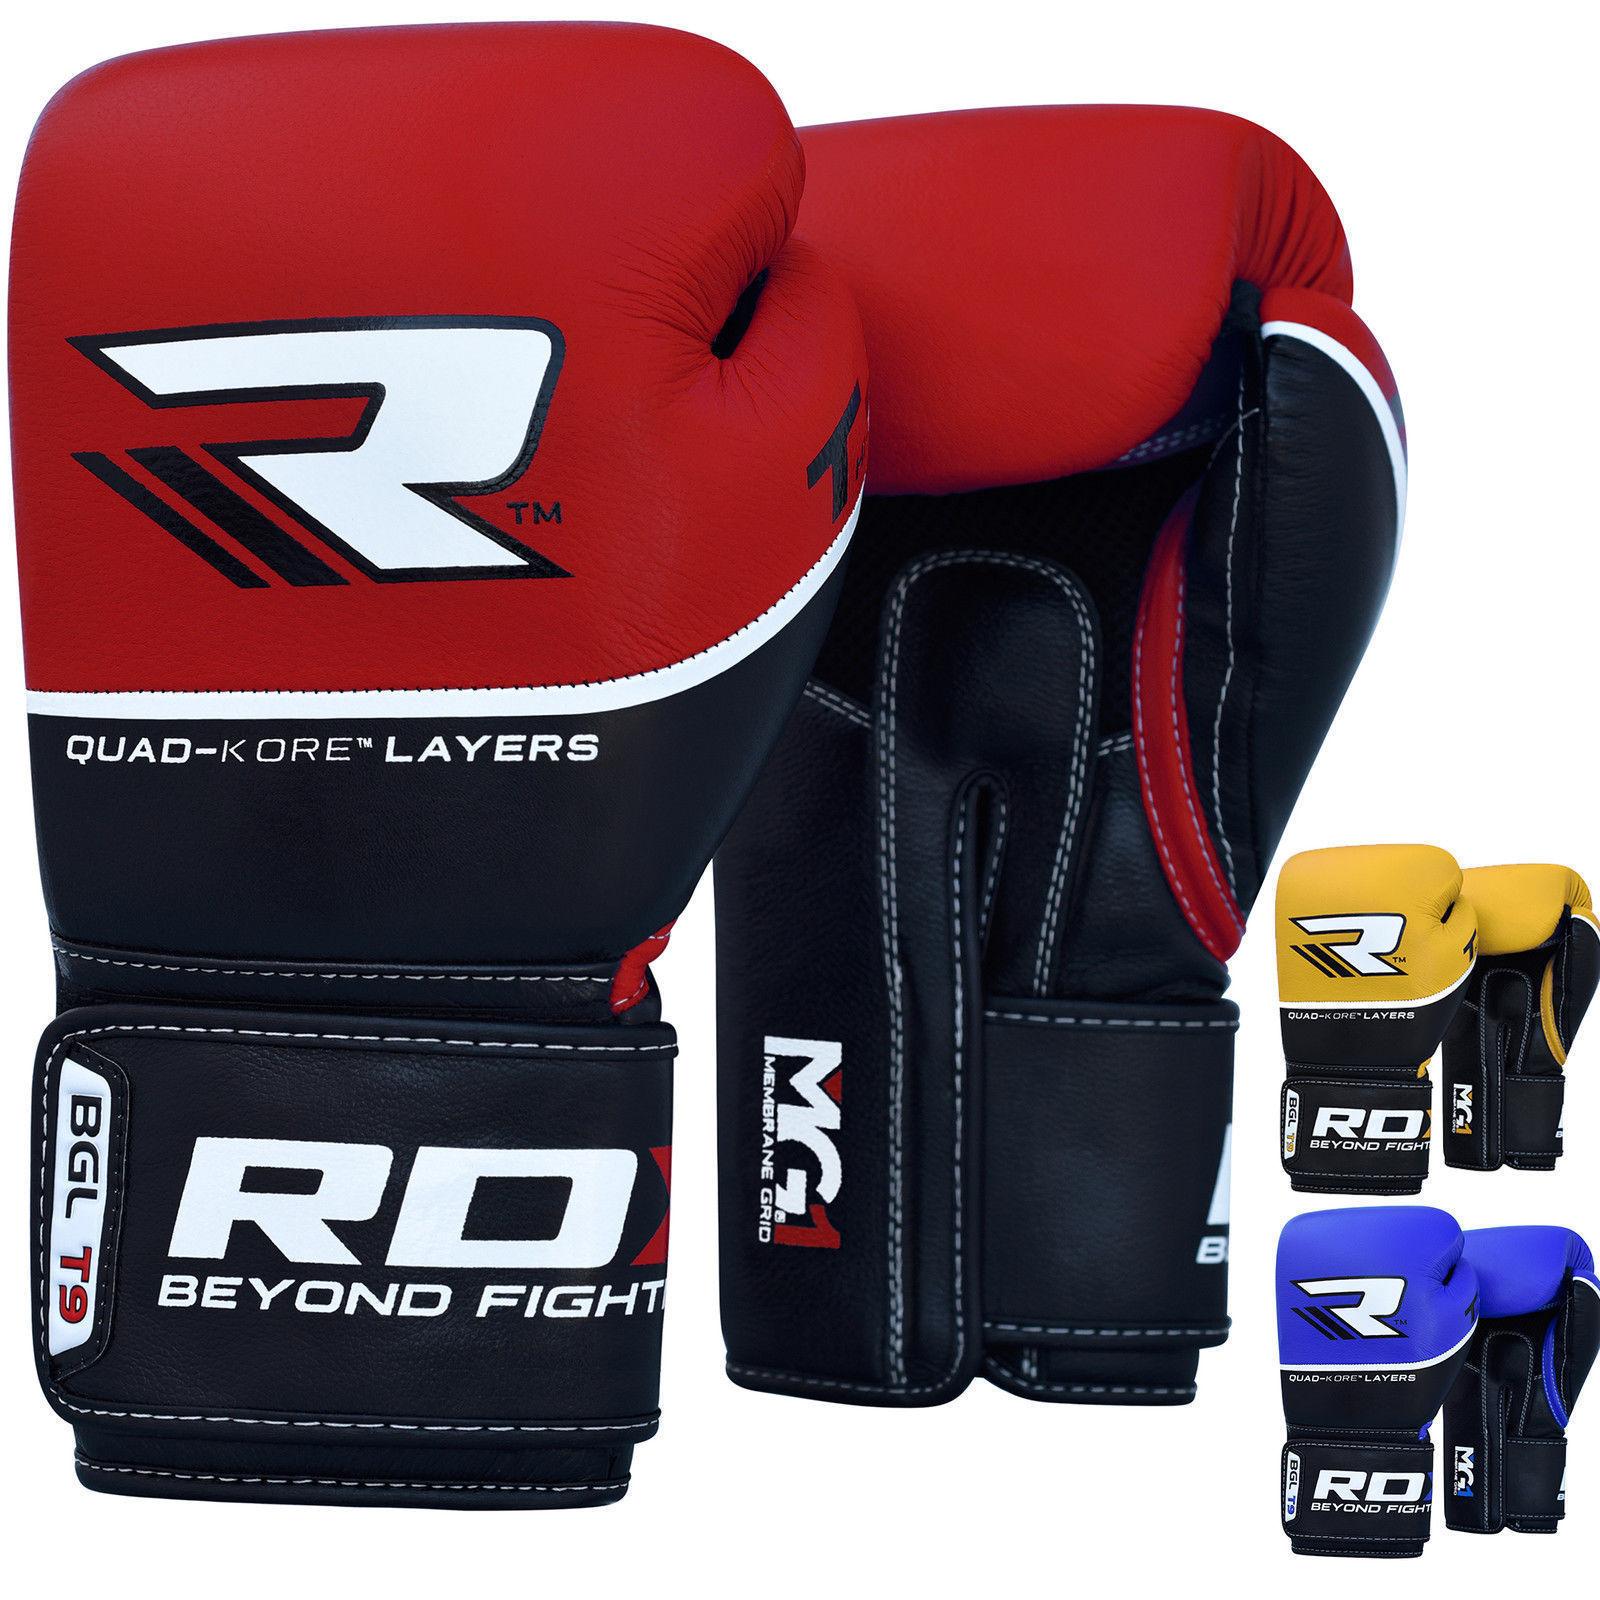 RDX QUAD-KORE Leather Boxing Glove